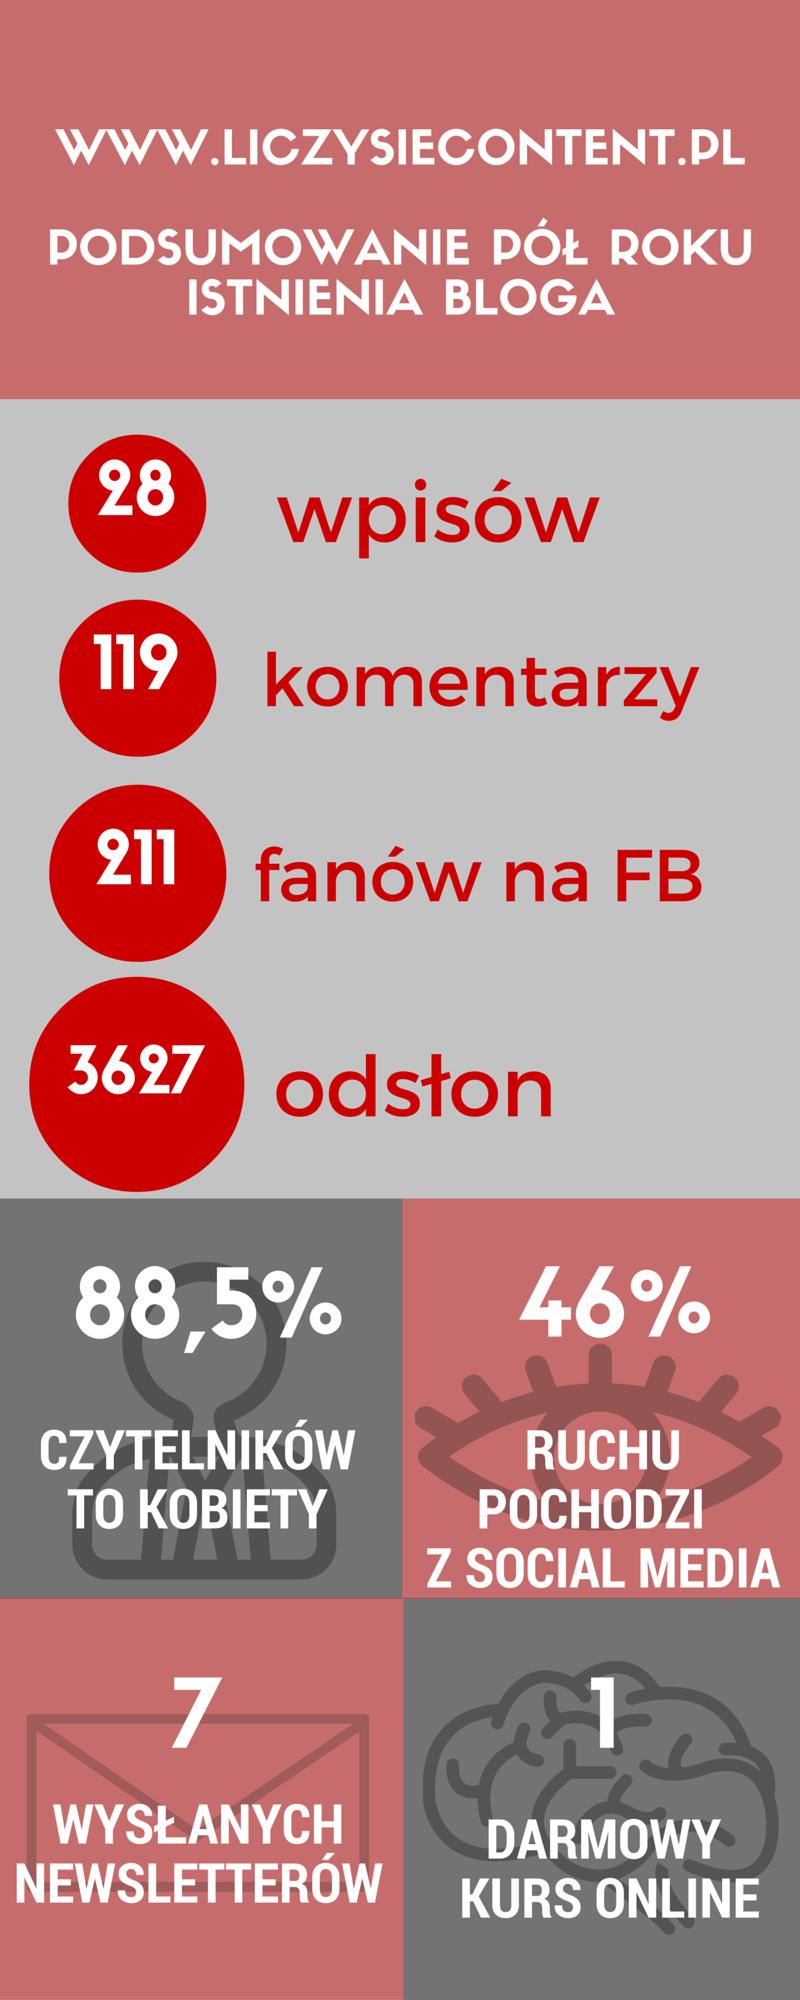 liczysiecontent.pl blog